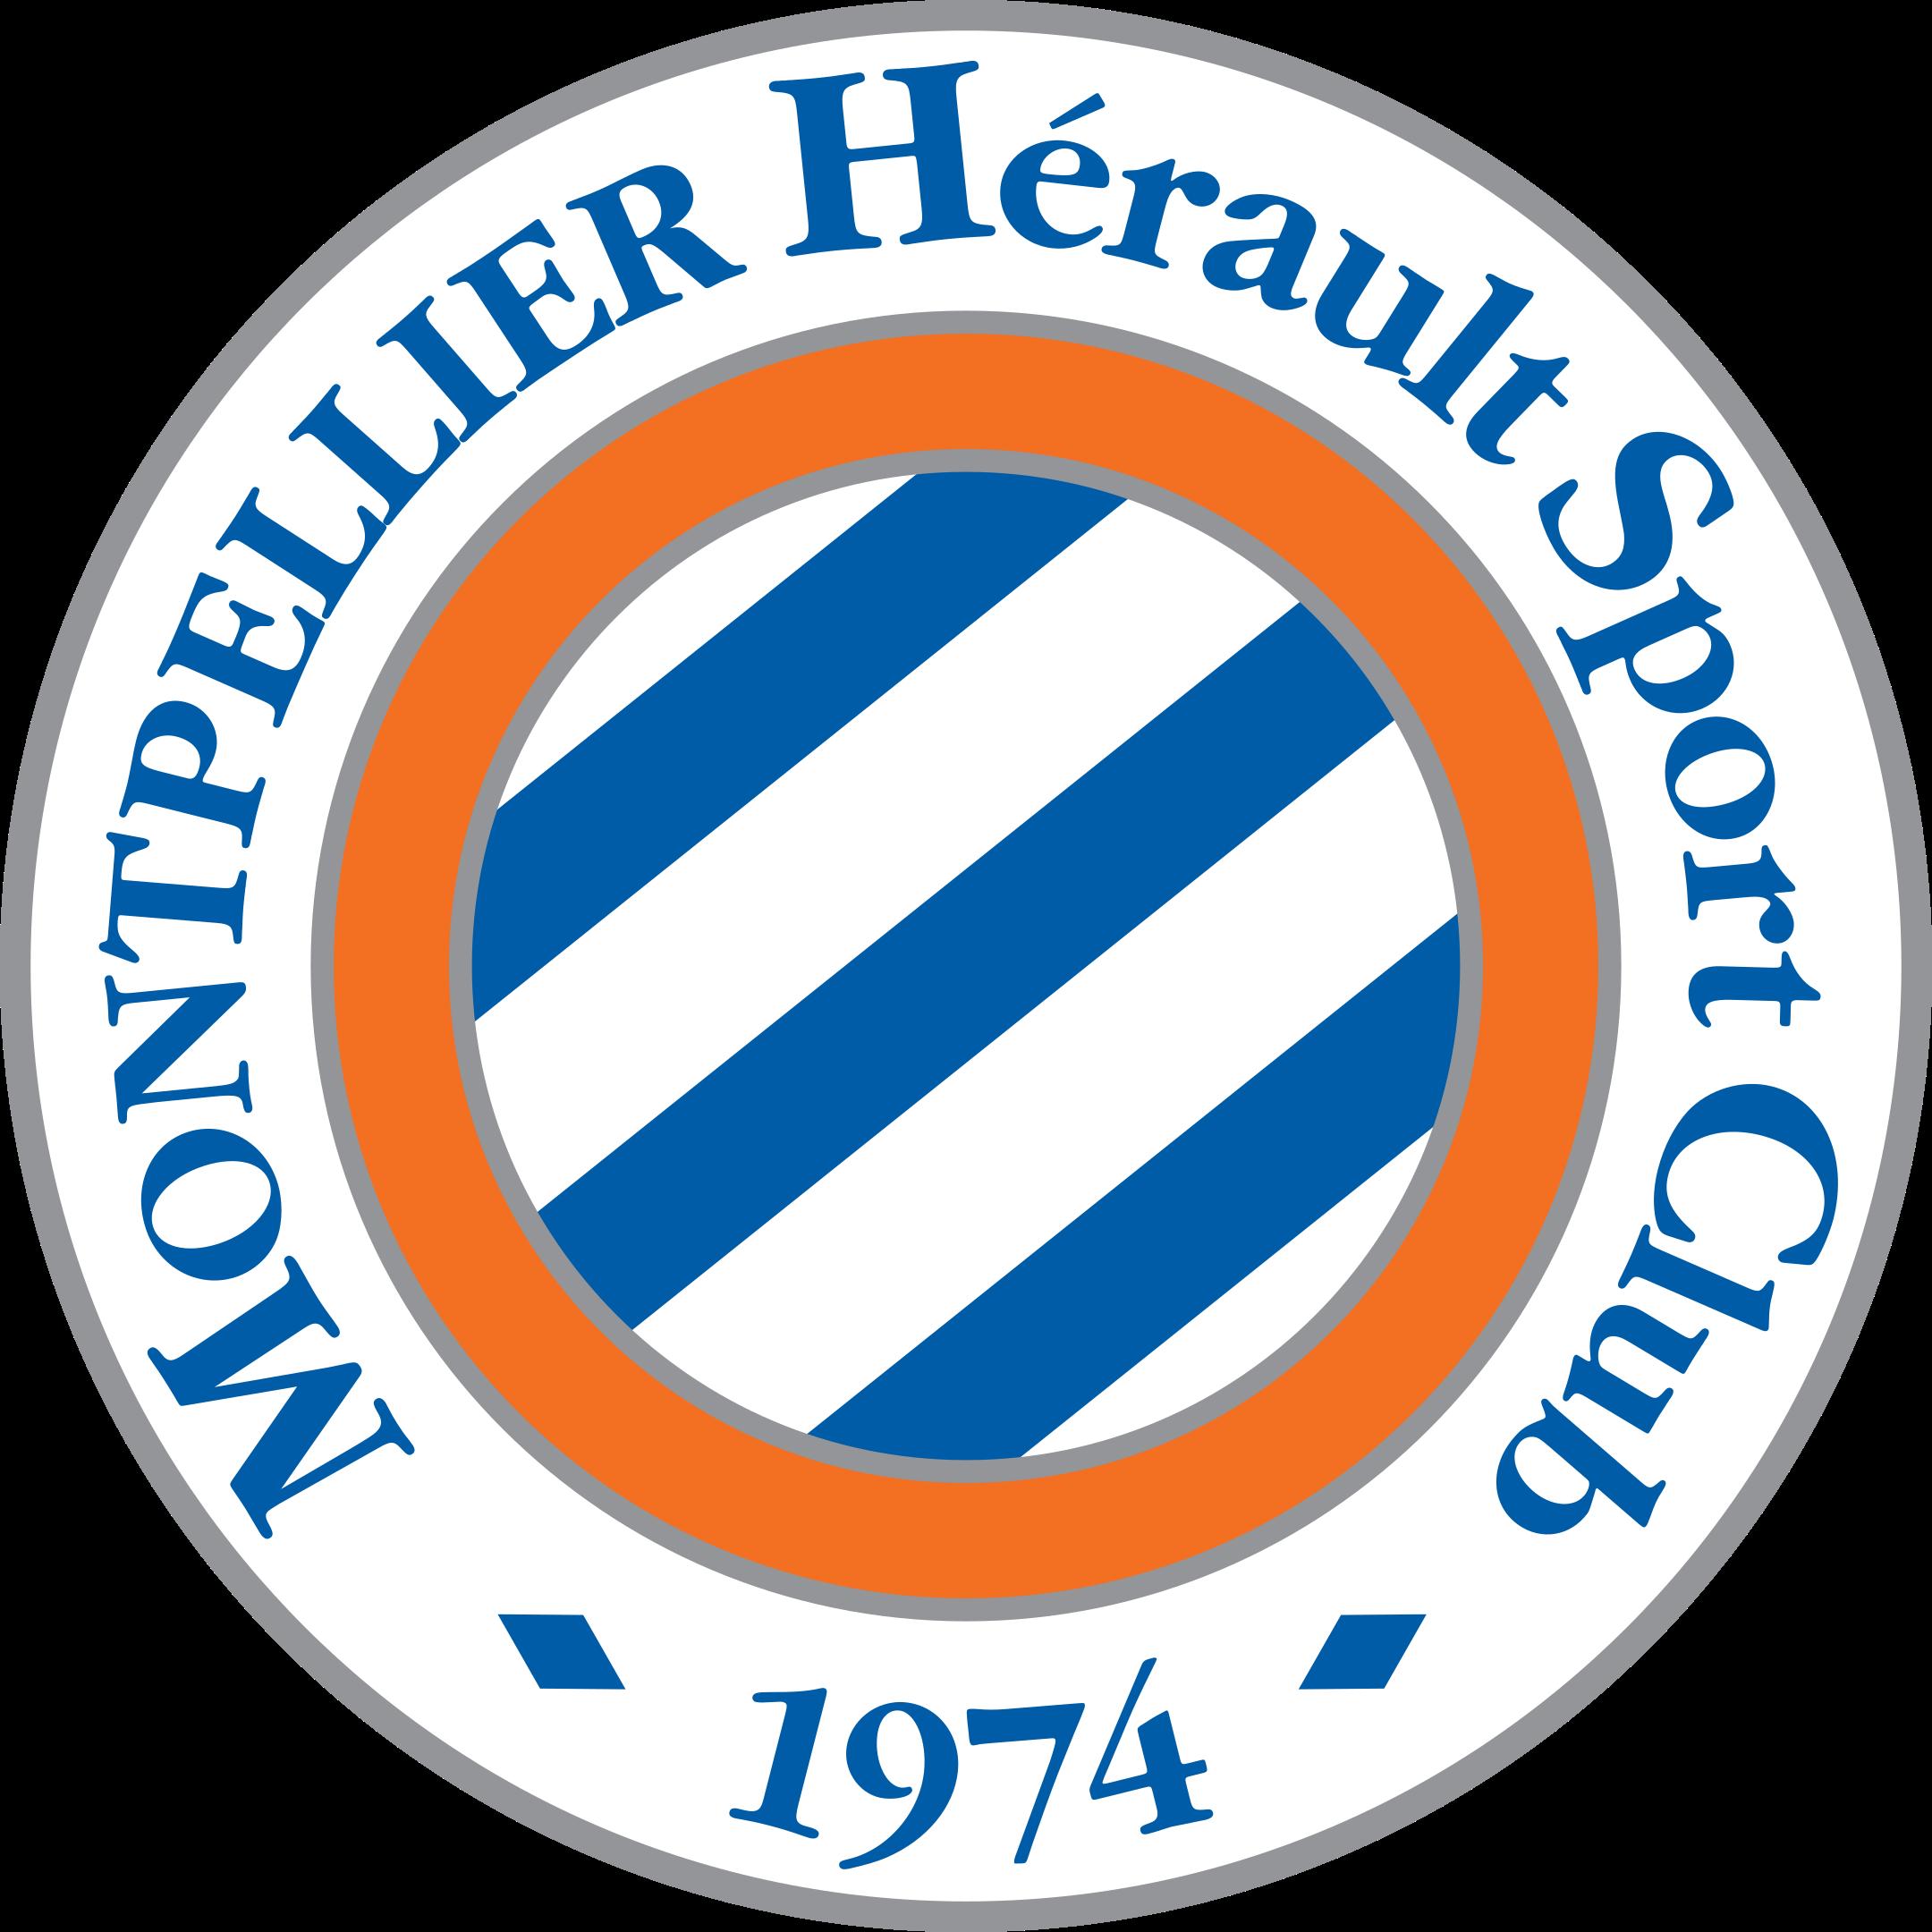 montpellier logo 1 - Montpellier Logo - Montpellier Hérault Sport Club